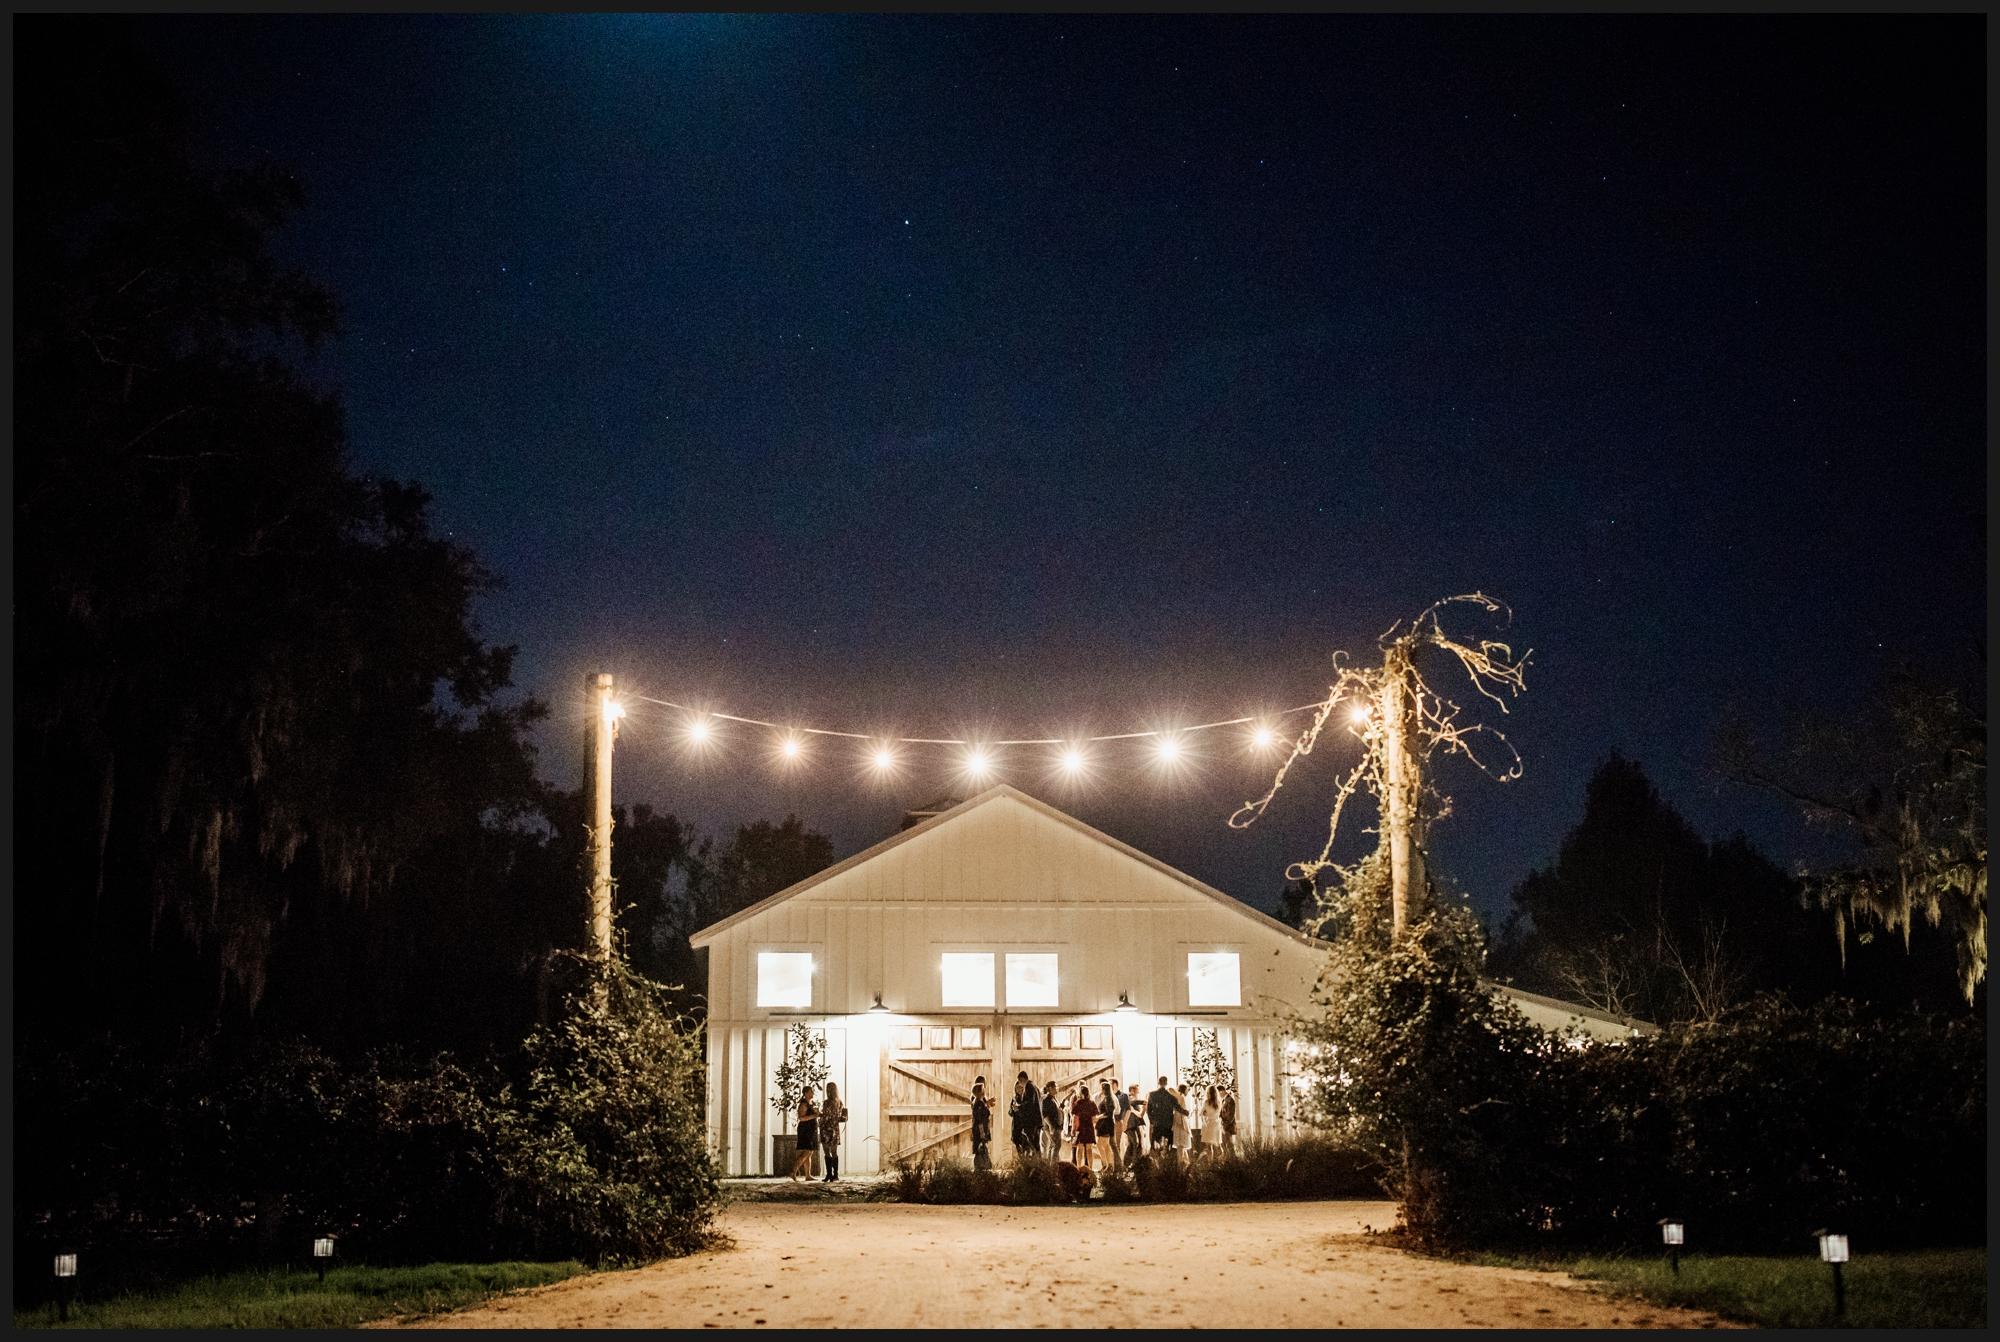 Orlando-Wedding-Photographer-destination-wedding-photographer-florida-wedding-photographer-hawaii-wedding-photographer_0553.jpg